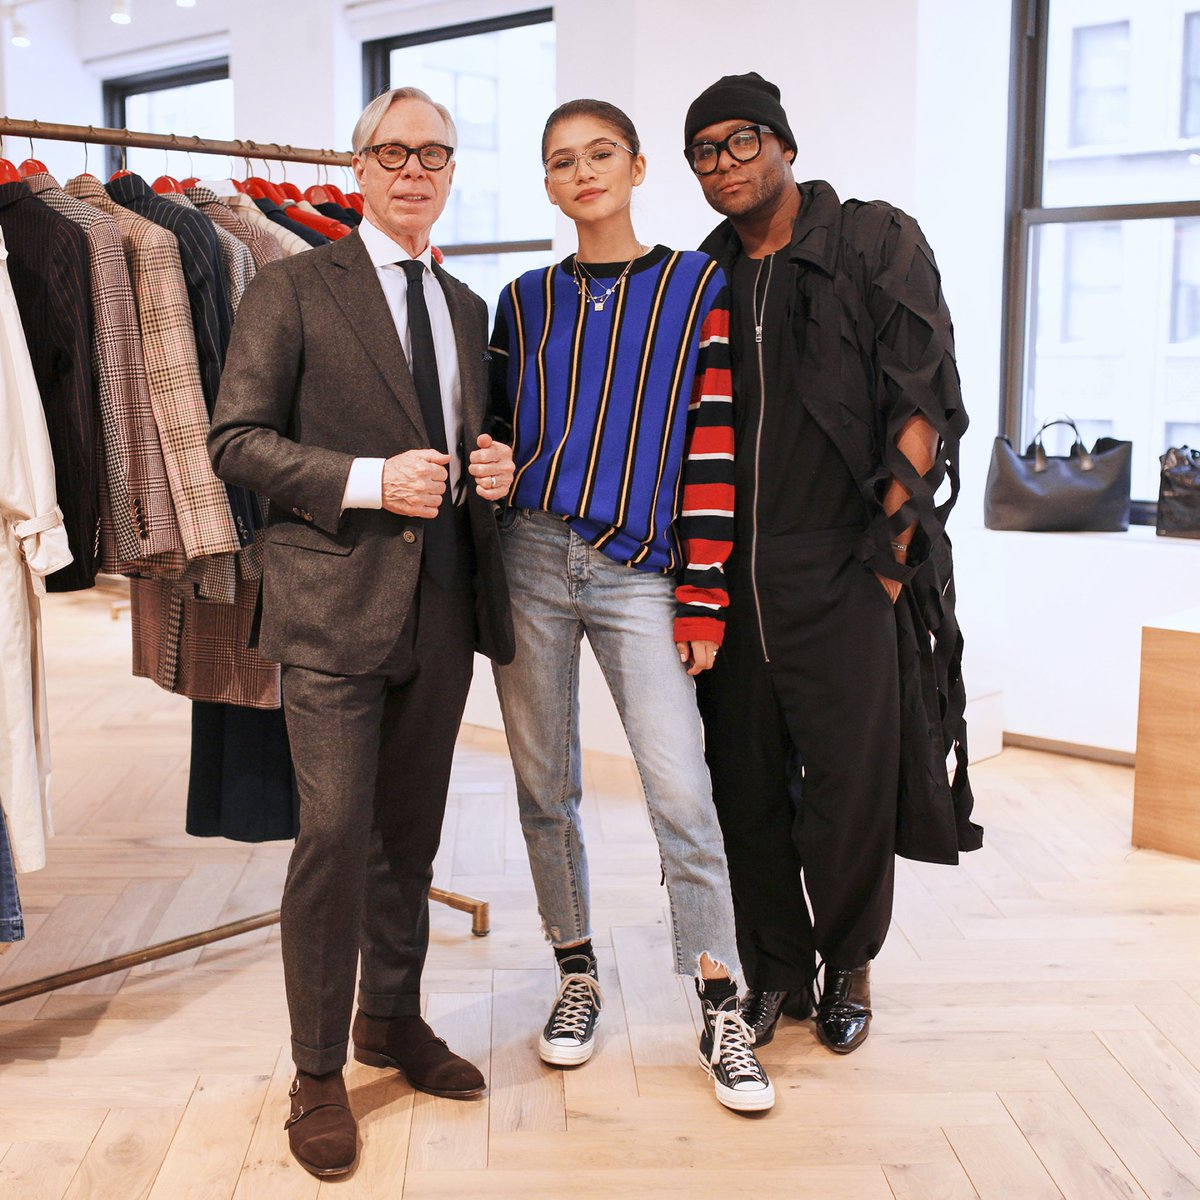 #TommyXZendaya コレクションのドリームチームを直撃!自信にあふれた女性たちが活躍した70年代のファッションにインスパイアされた新しいコレクションが、今まさに誕生しようとしています ! @Zendaya https://t.co/9qTeQ2zP8w